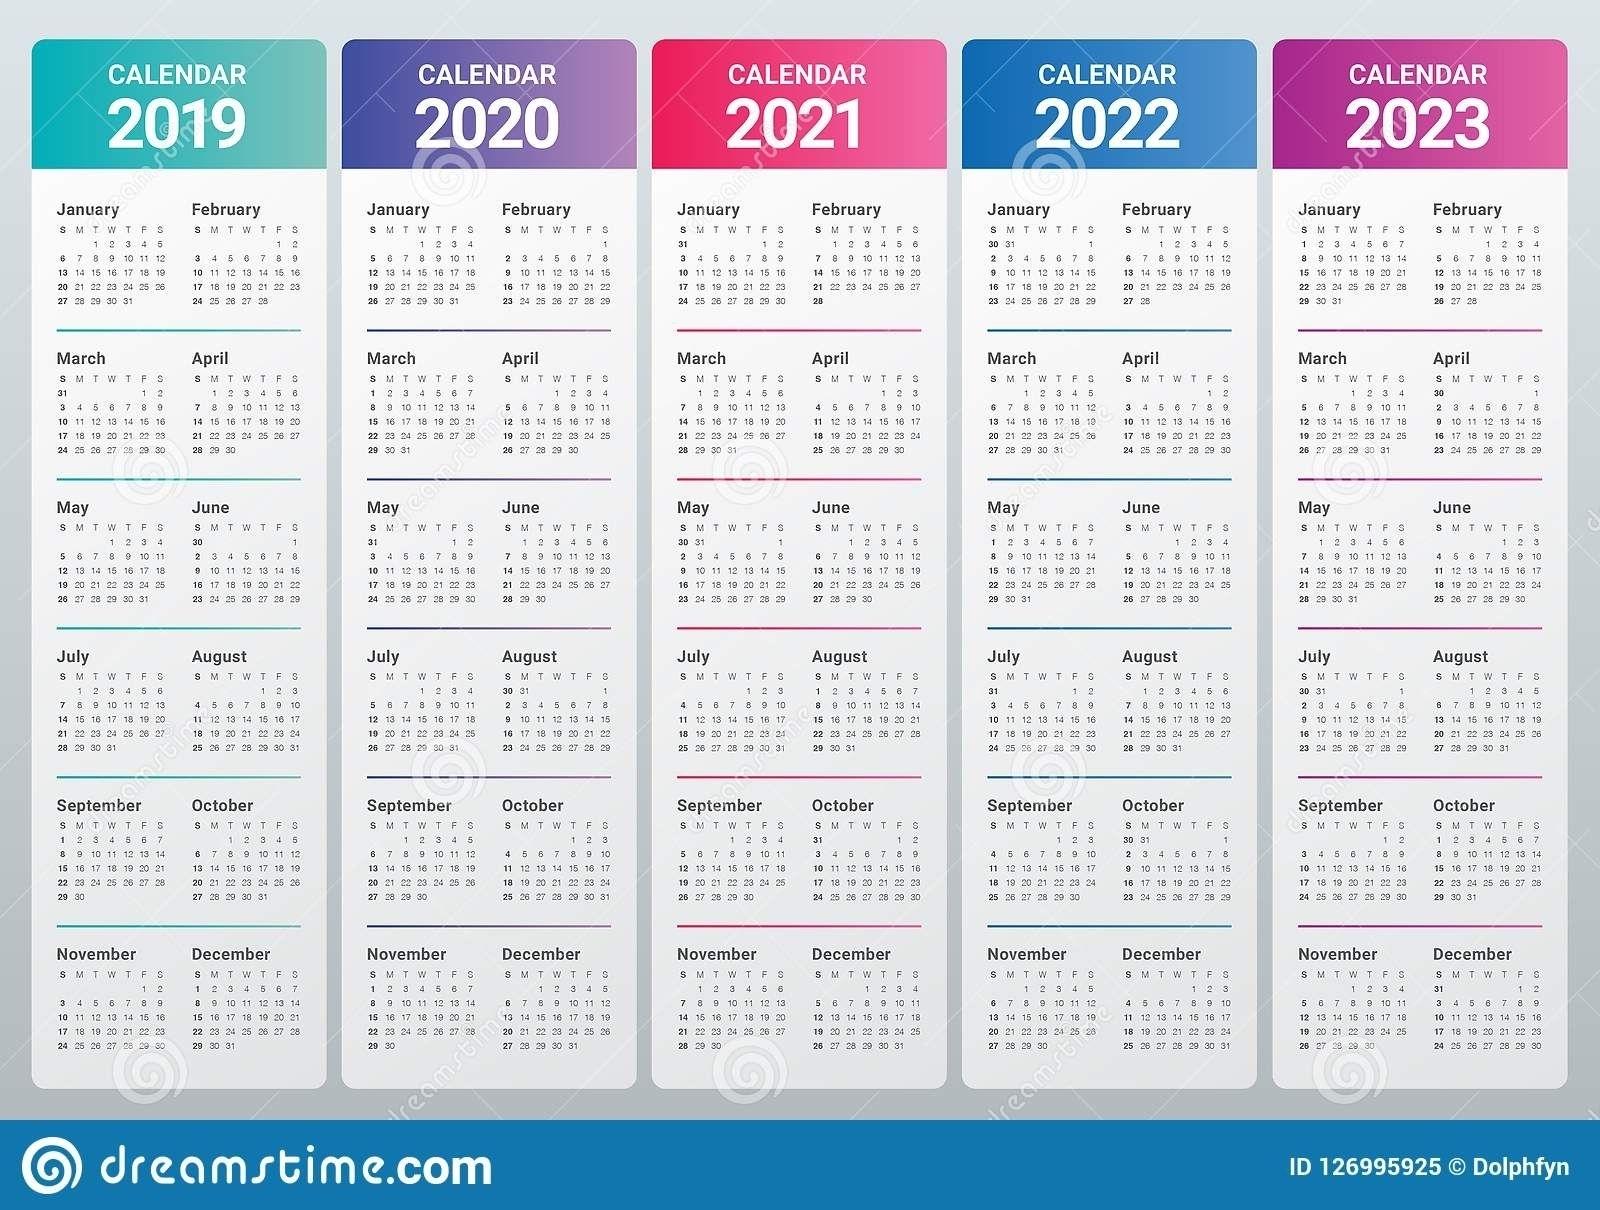 Effective Free Printable 5 Year Calendar | Get Your Calendar Printable